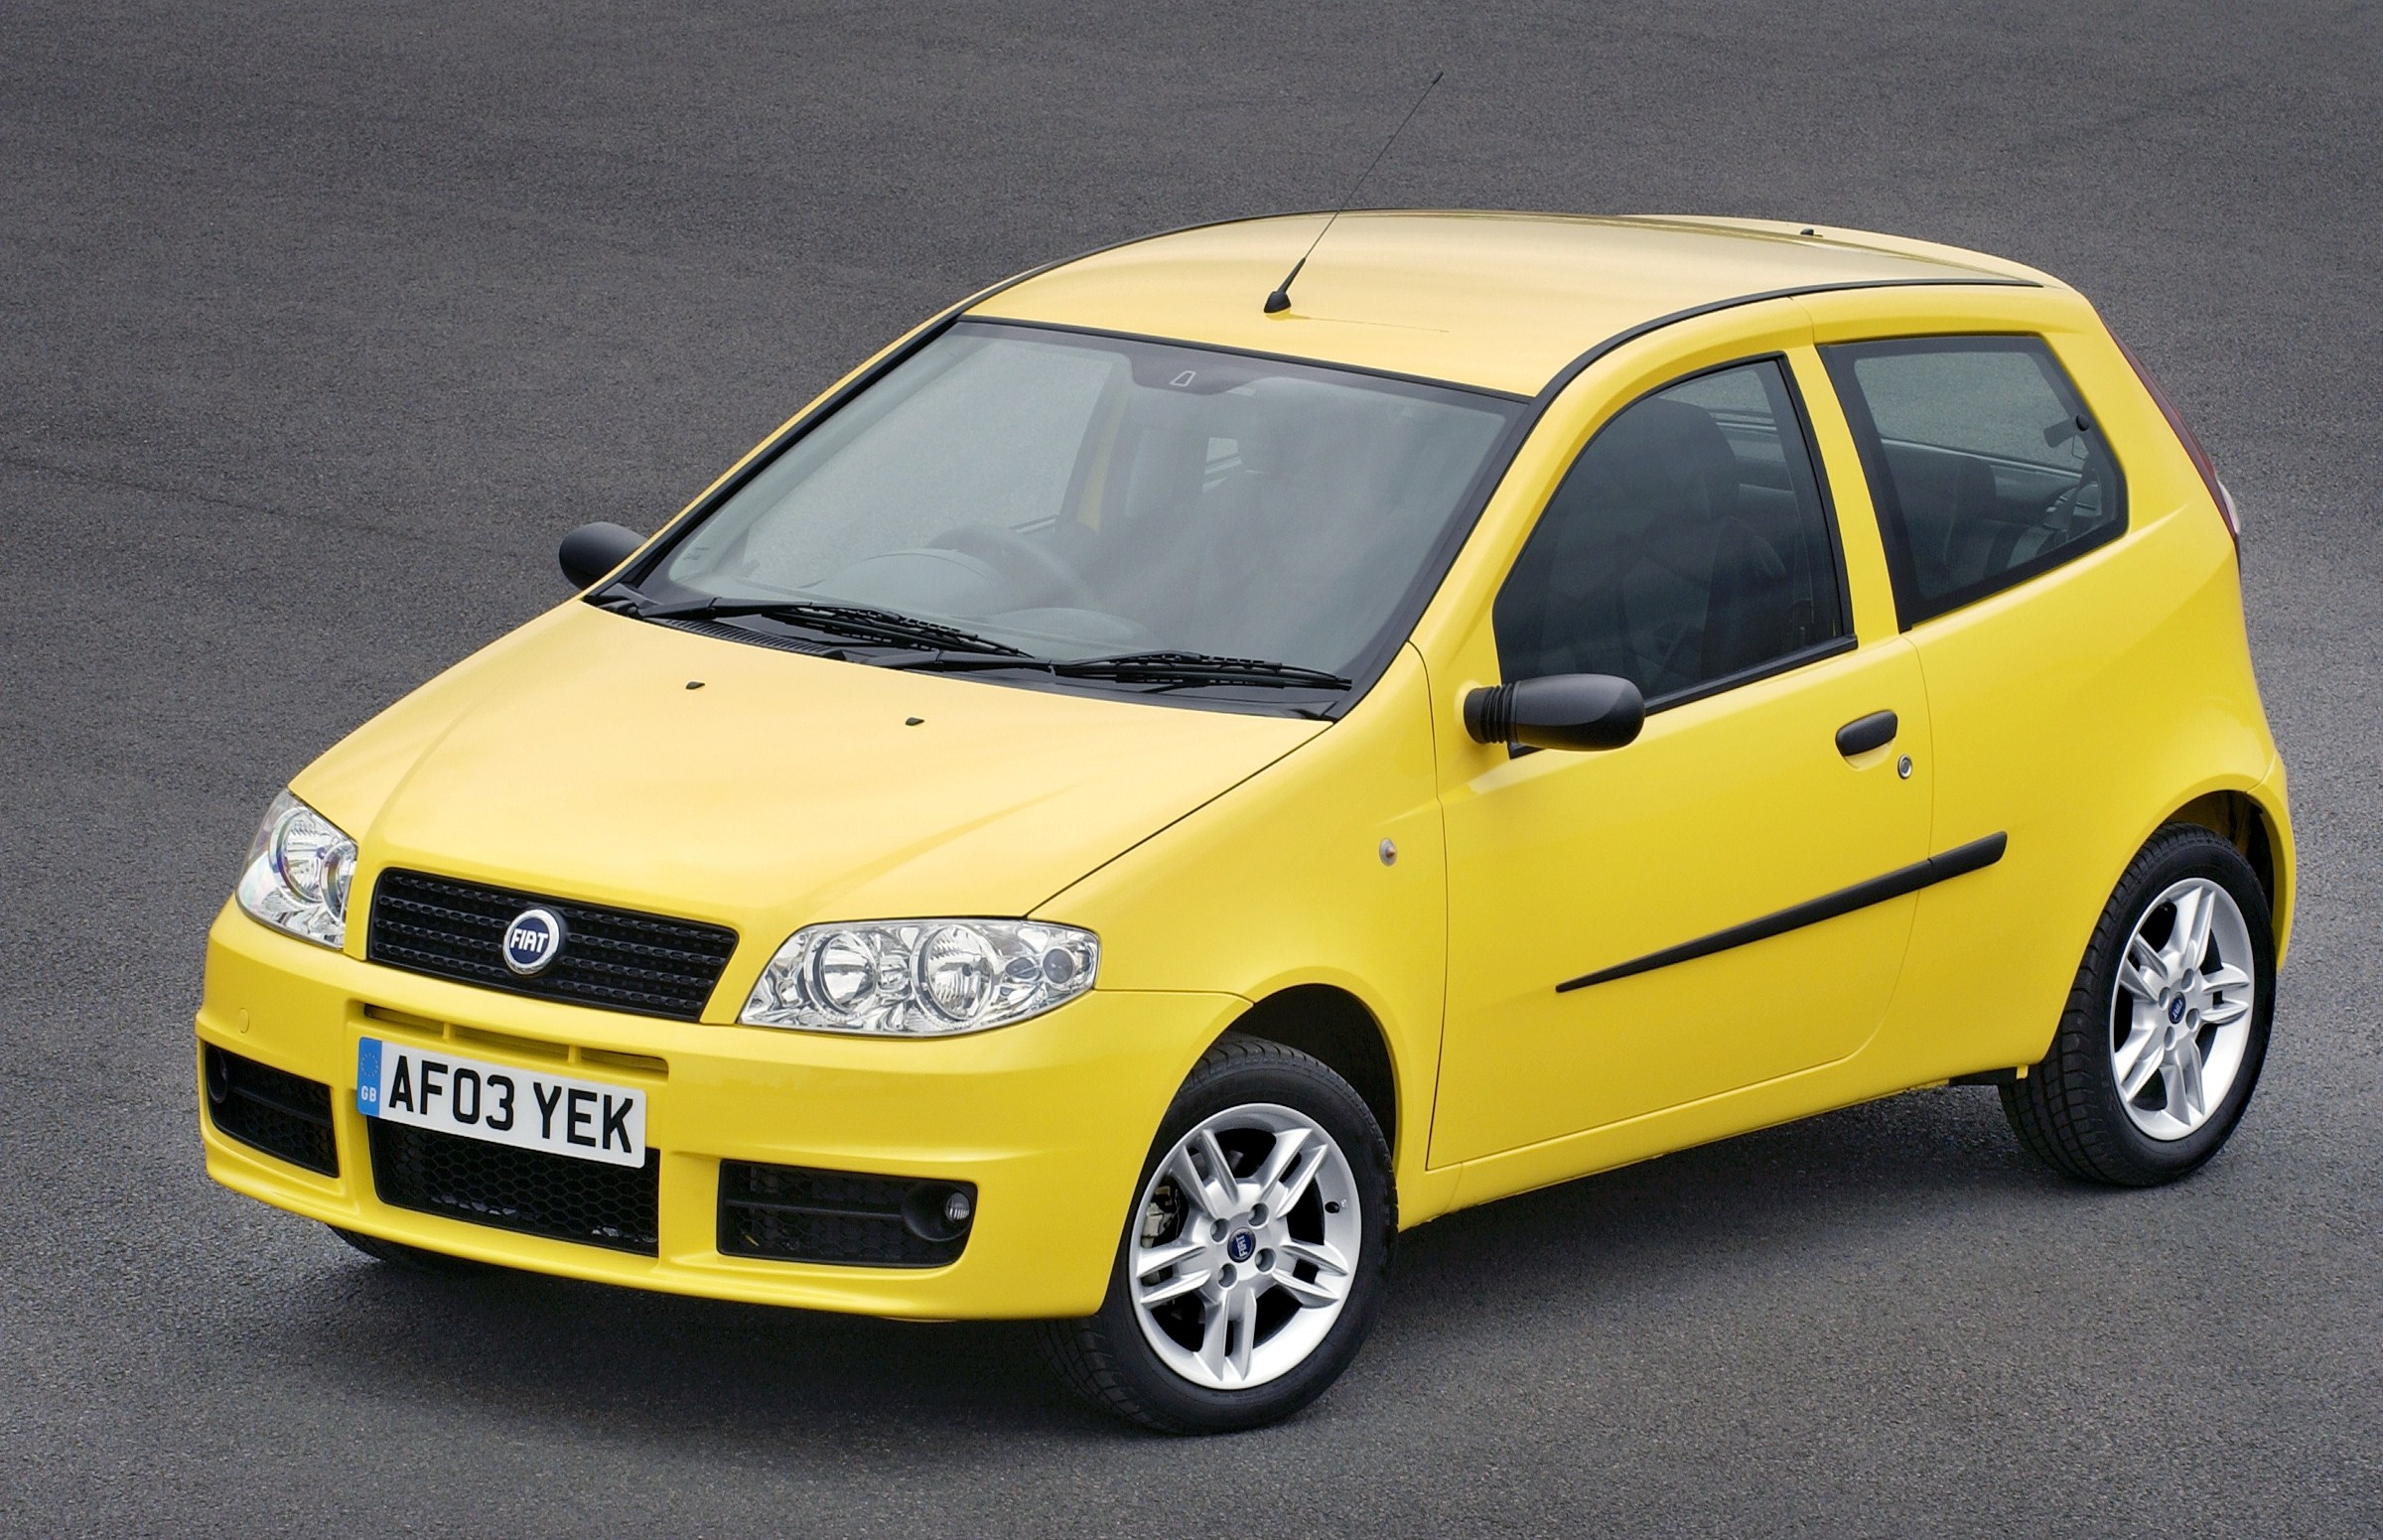 2003 Fiat Punto Picture 39945